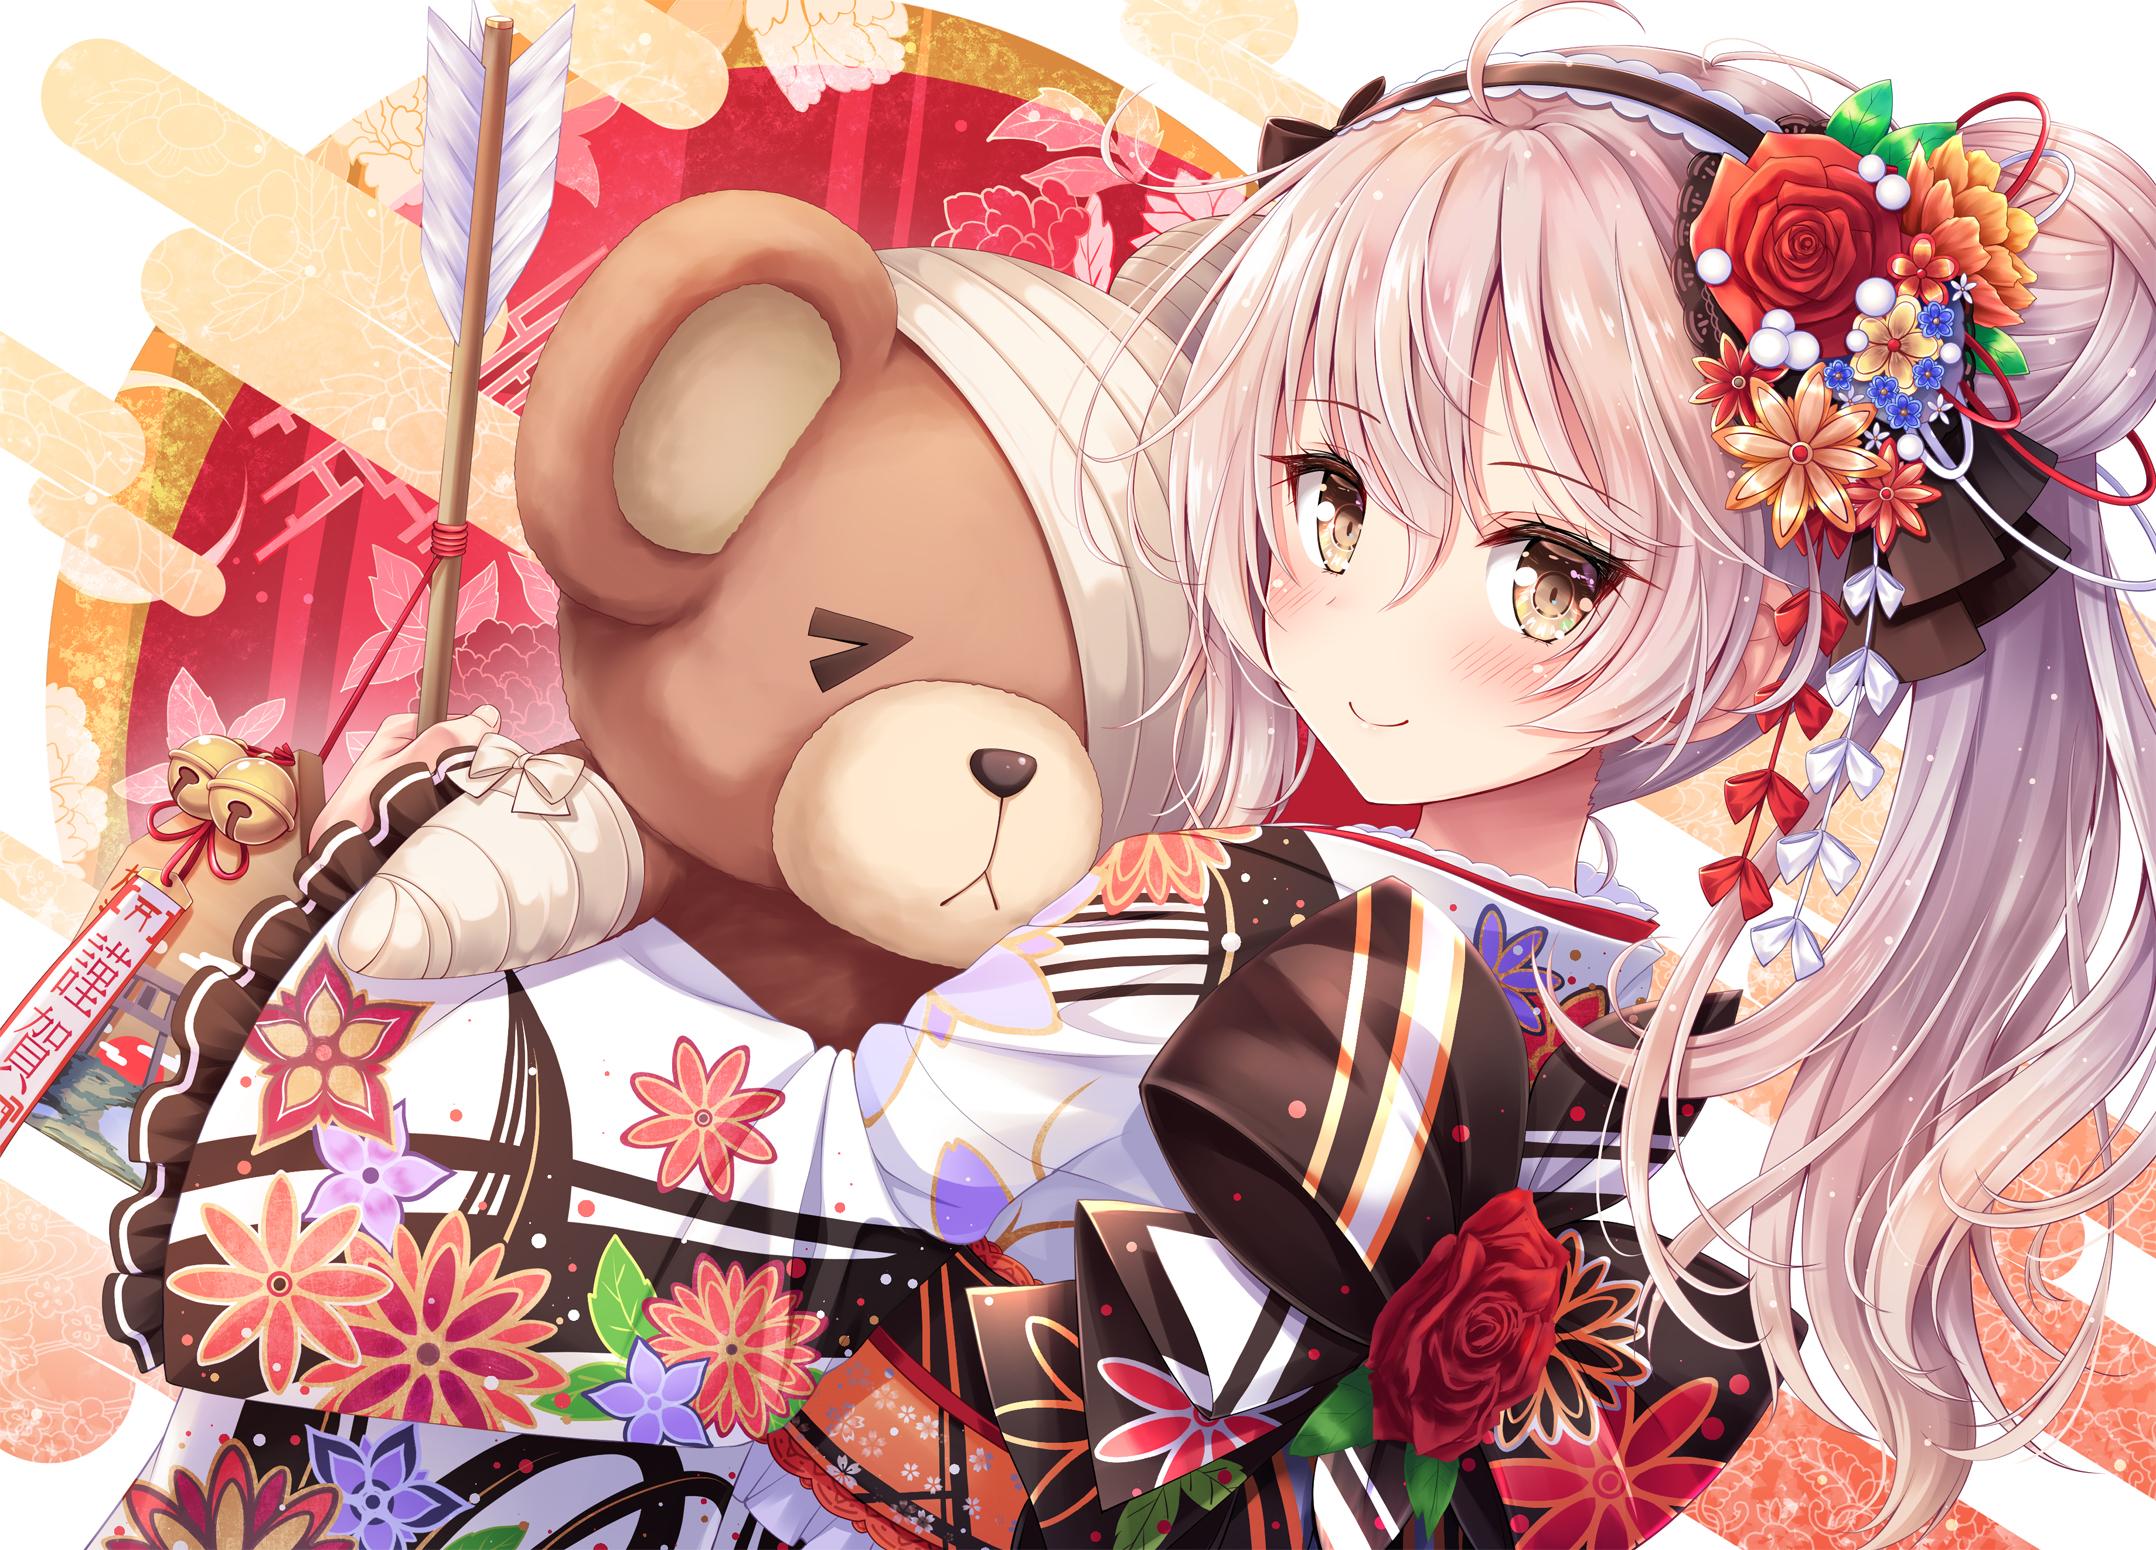 Arisu Shimada Brown Eyes Girl Japanese Clothes Long Hair Teddy Bear White Hair 2156x1550